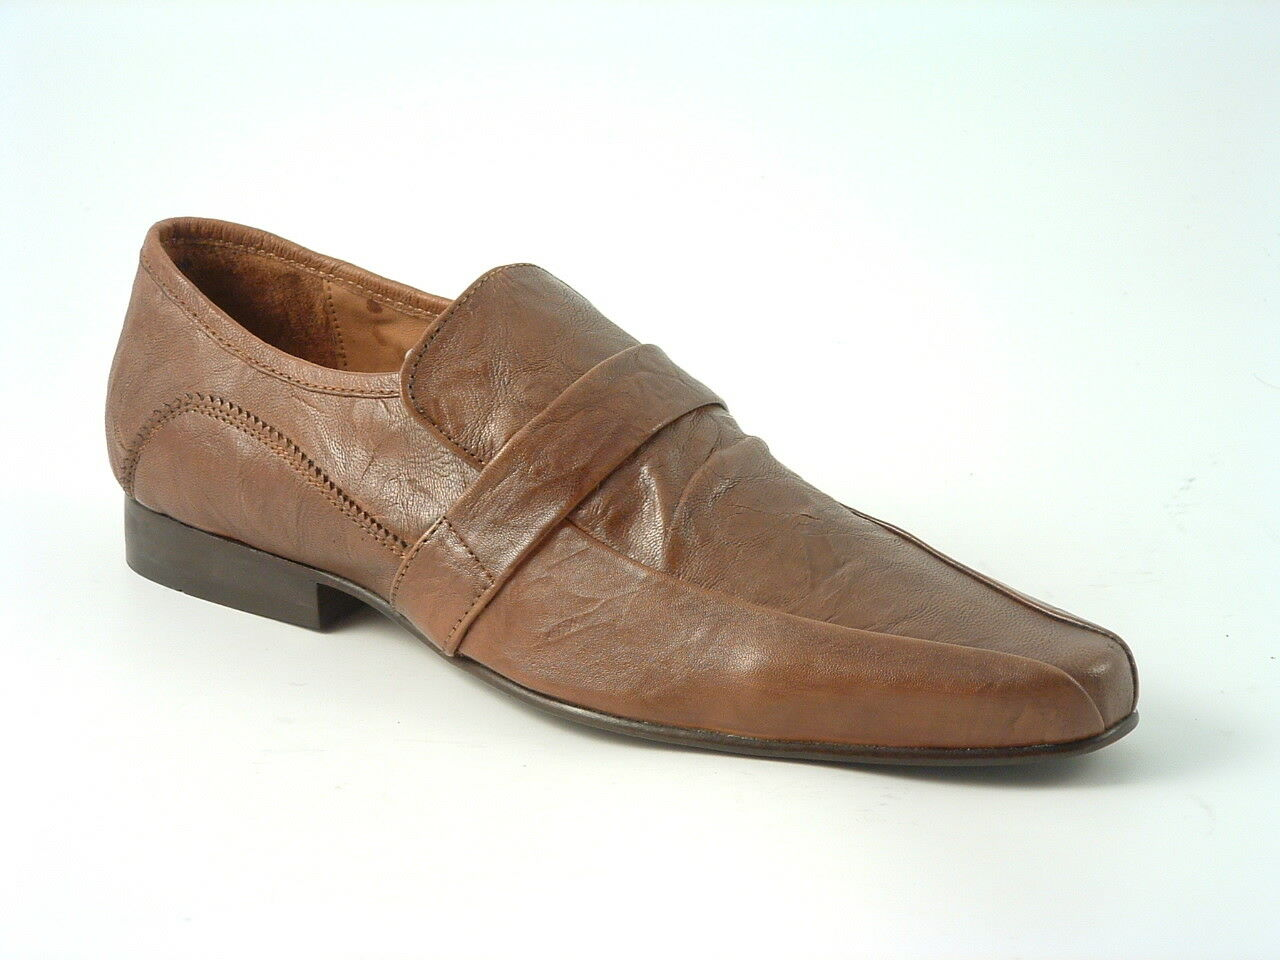 Tissotti Men's Tan On Crunch Leather Tab Slip On Tan Shoes Formal Fashion dfb9f0